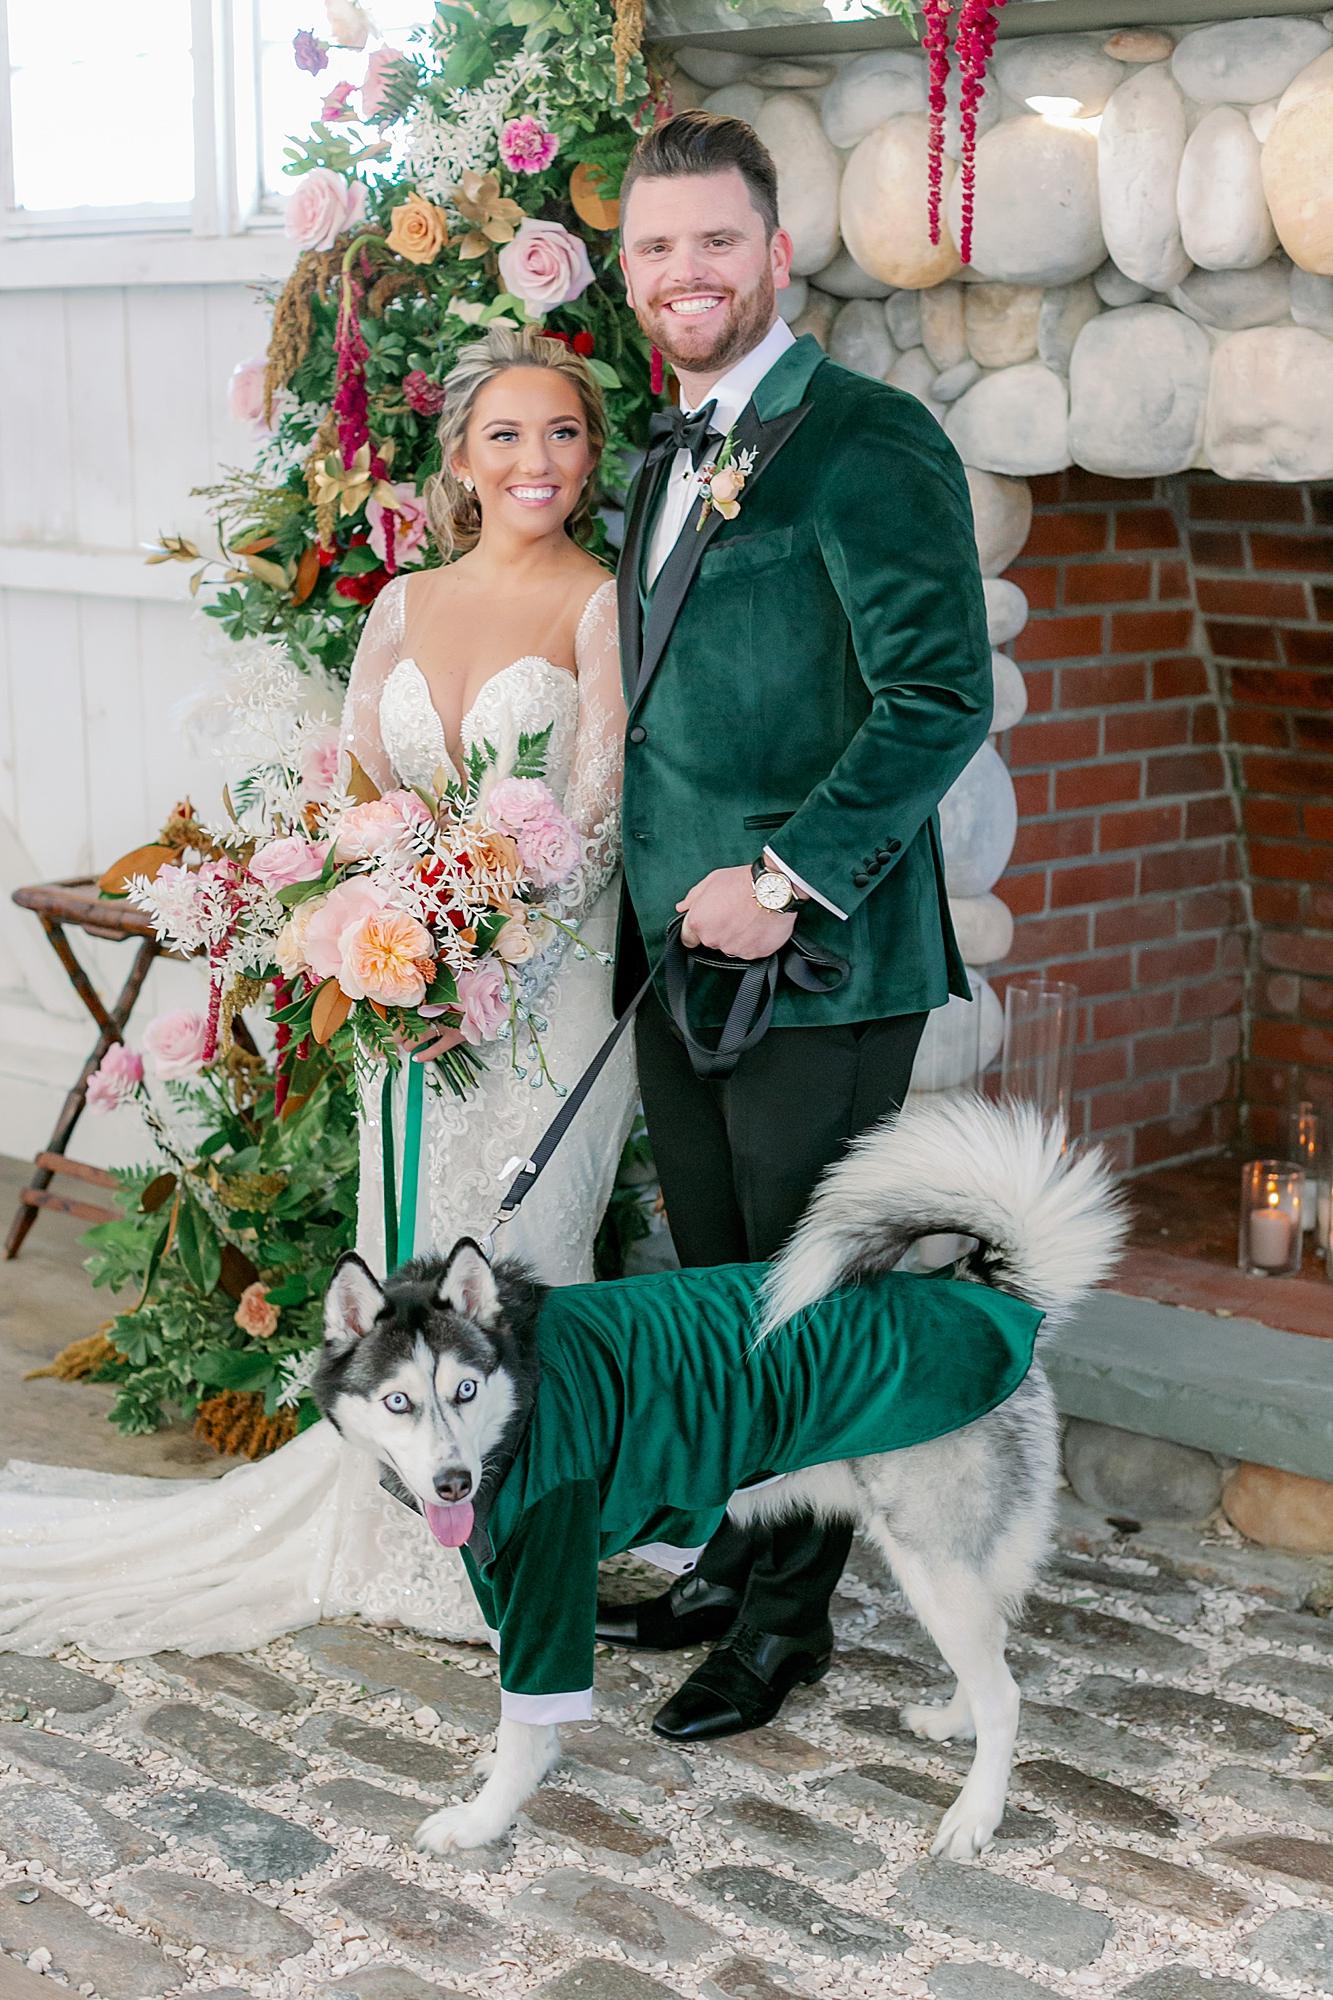 Bonnet Island Estate Film Wedding Photography by Magdalena Studios 0032